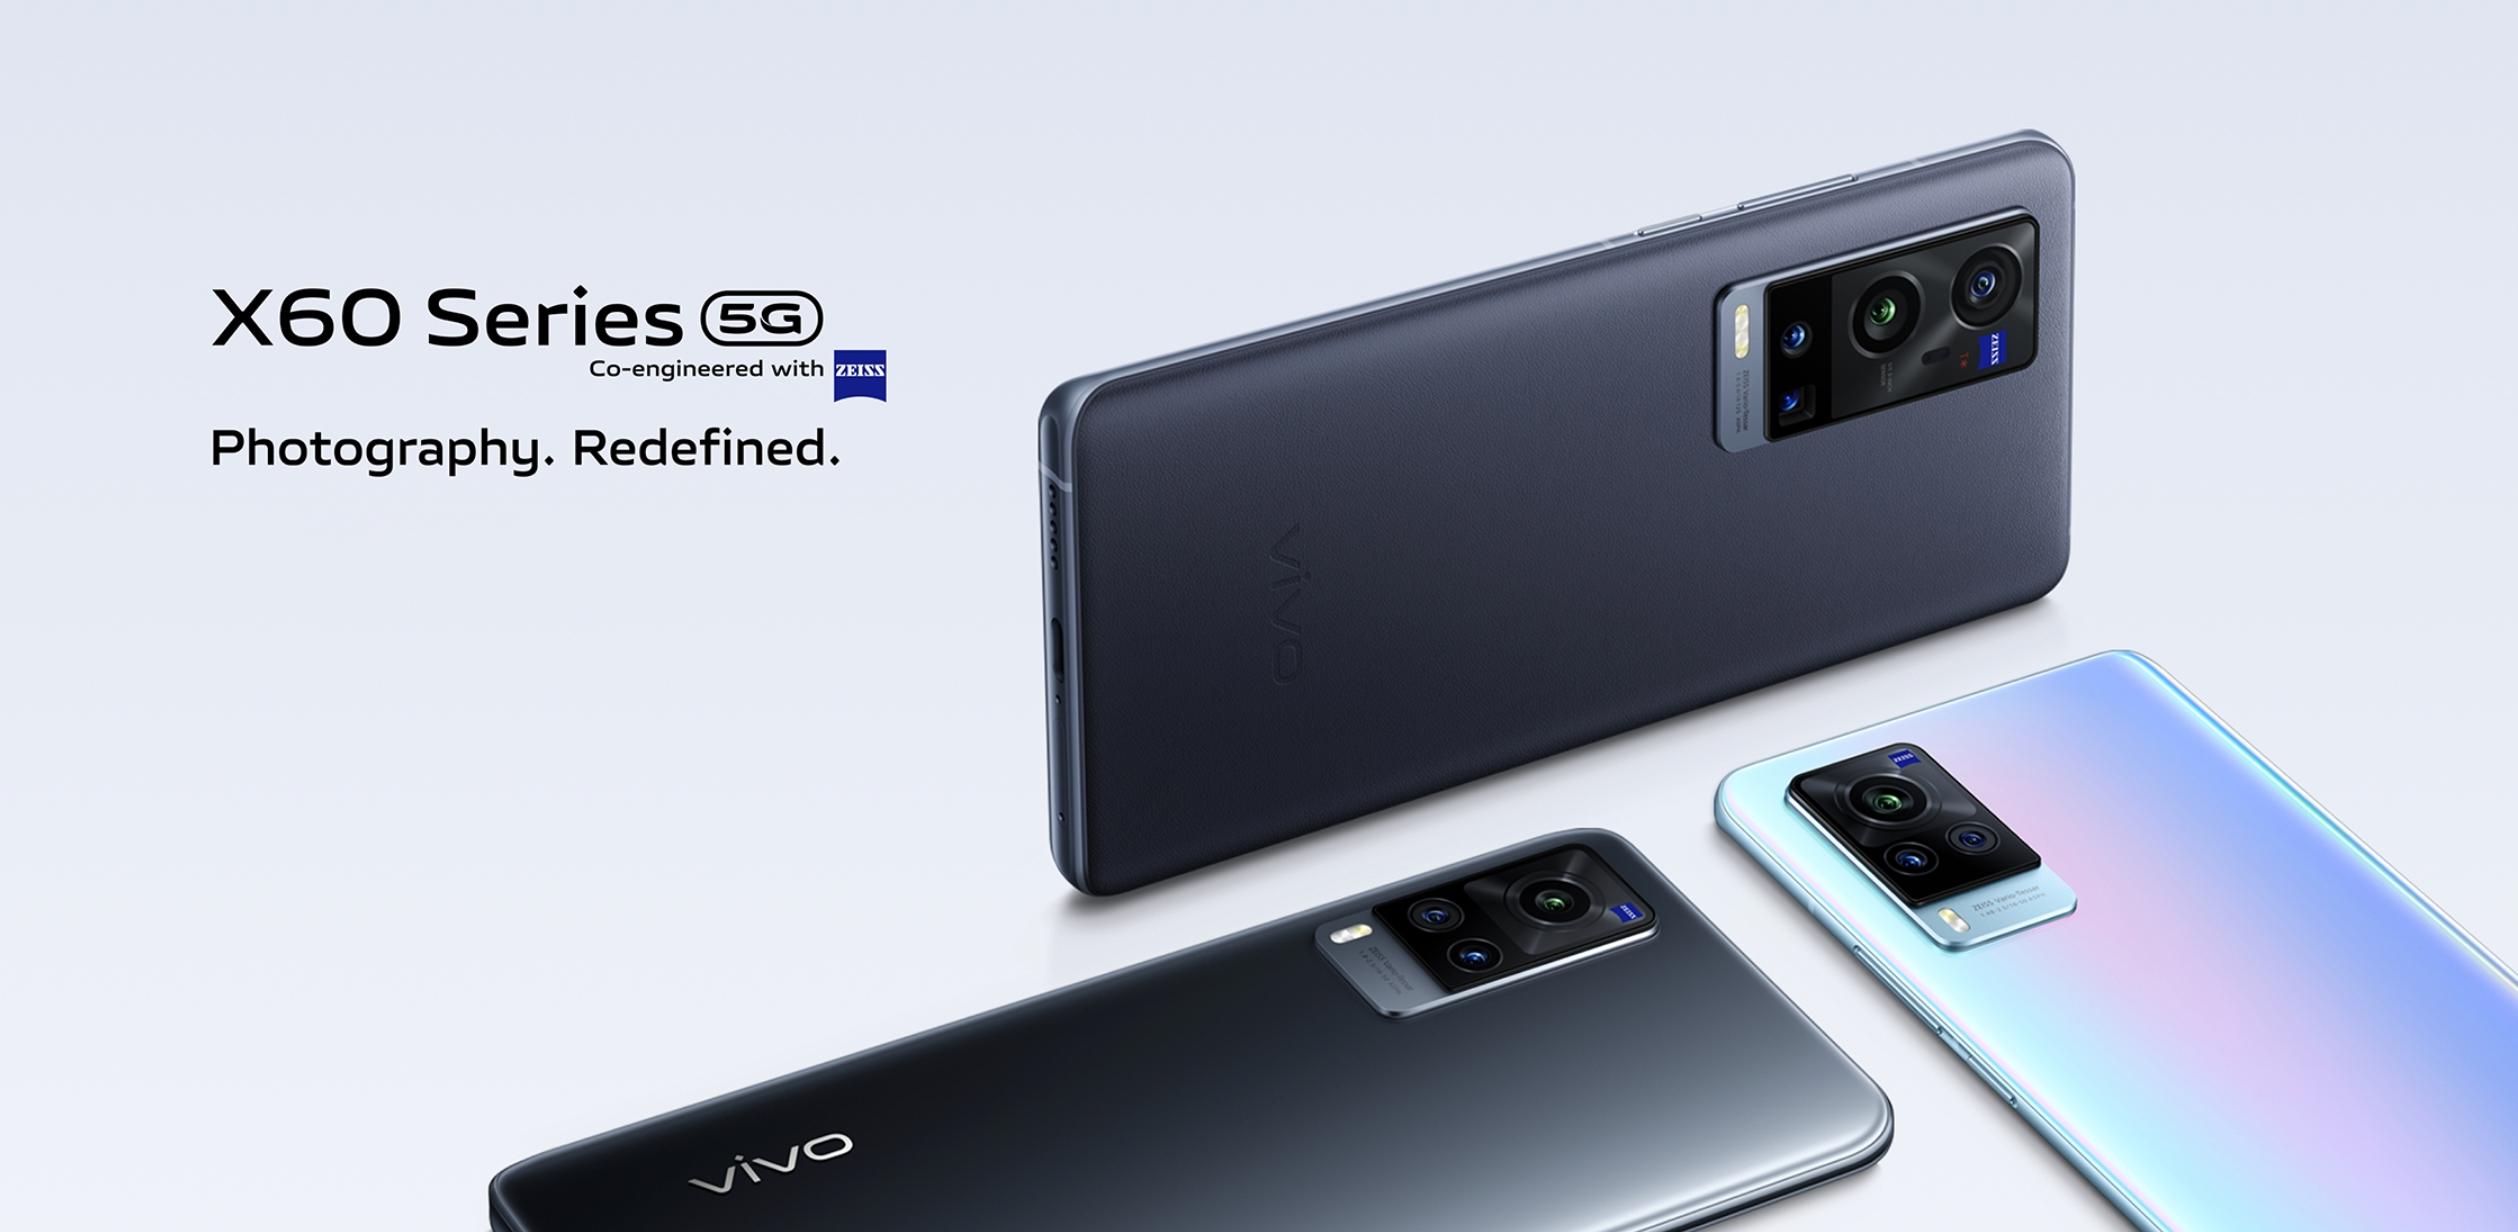 Vivo X60, Vivo X60 Pro и Vivo X60 Pro представили на глобальном рынке: флагманская линейка смартфонов с чипами Qualcomm и оптикой Zeiss